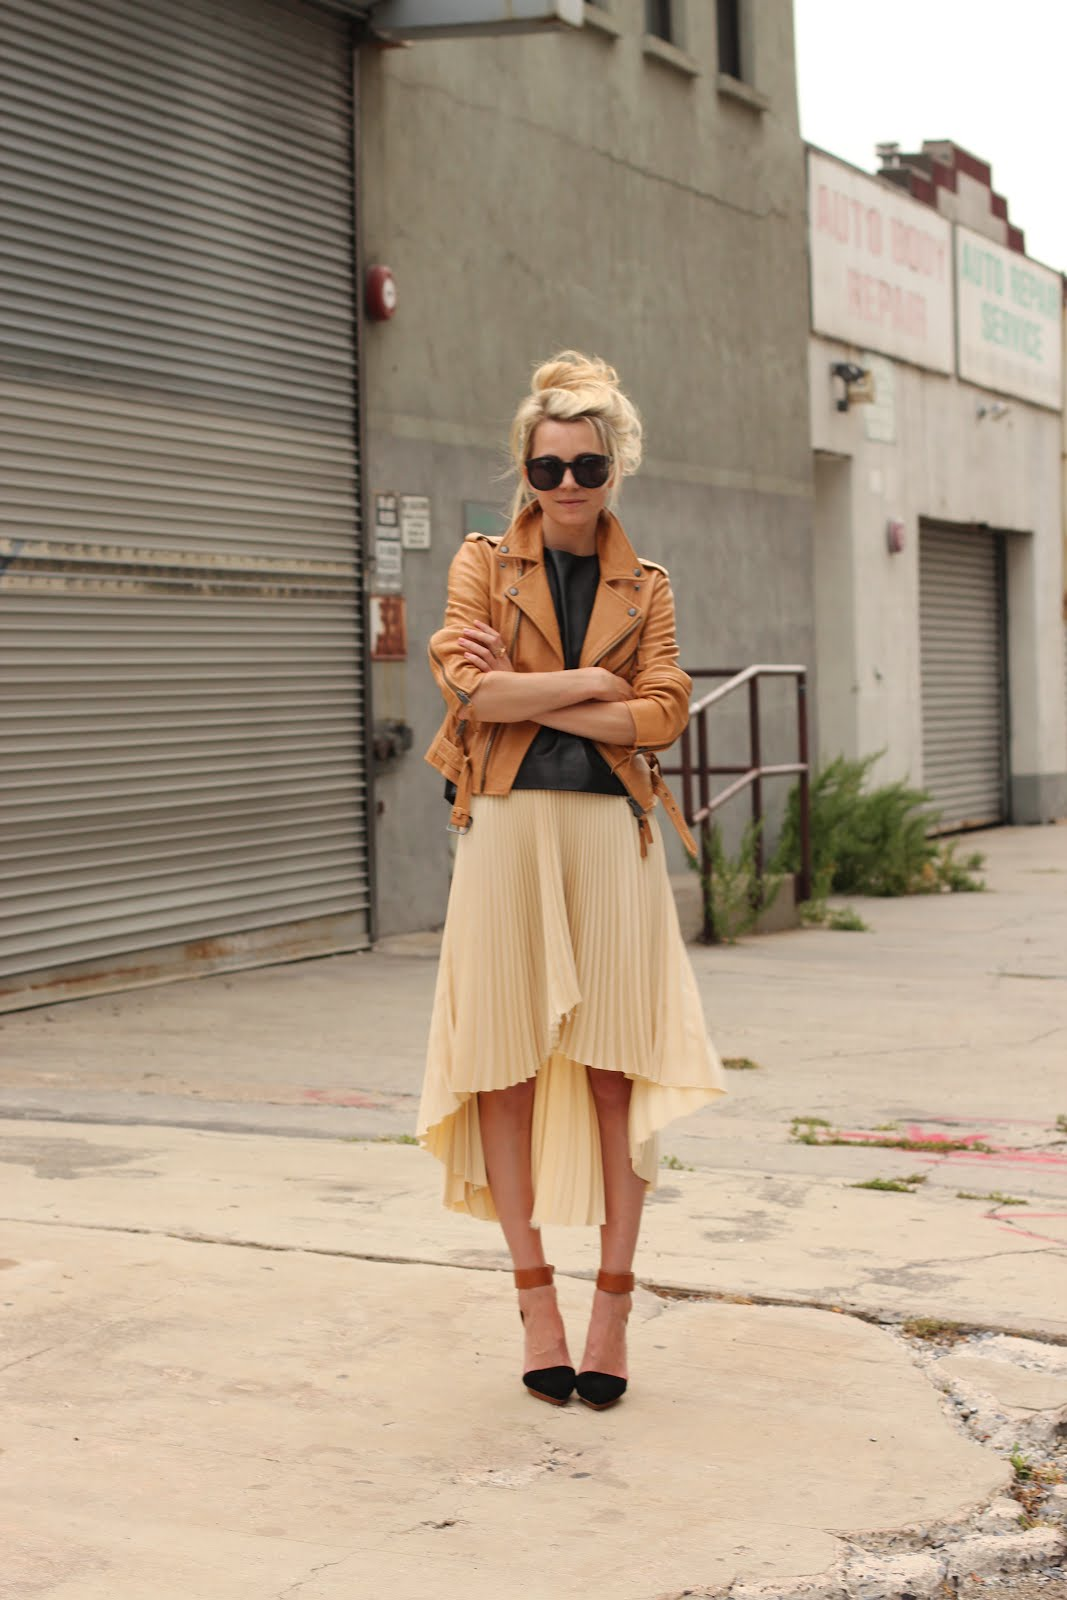 San francisco street fashion 4